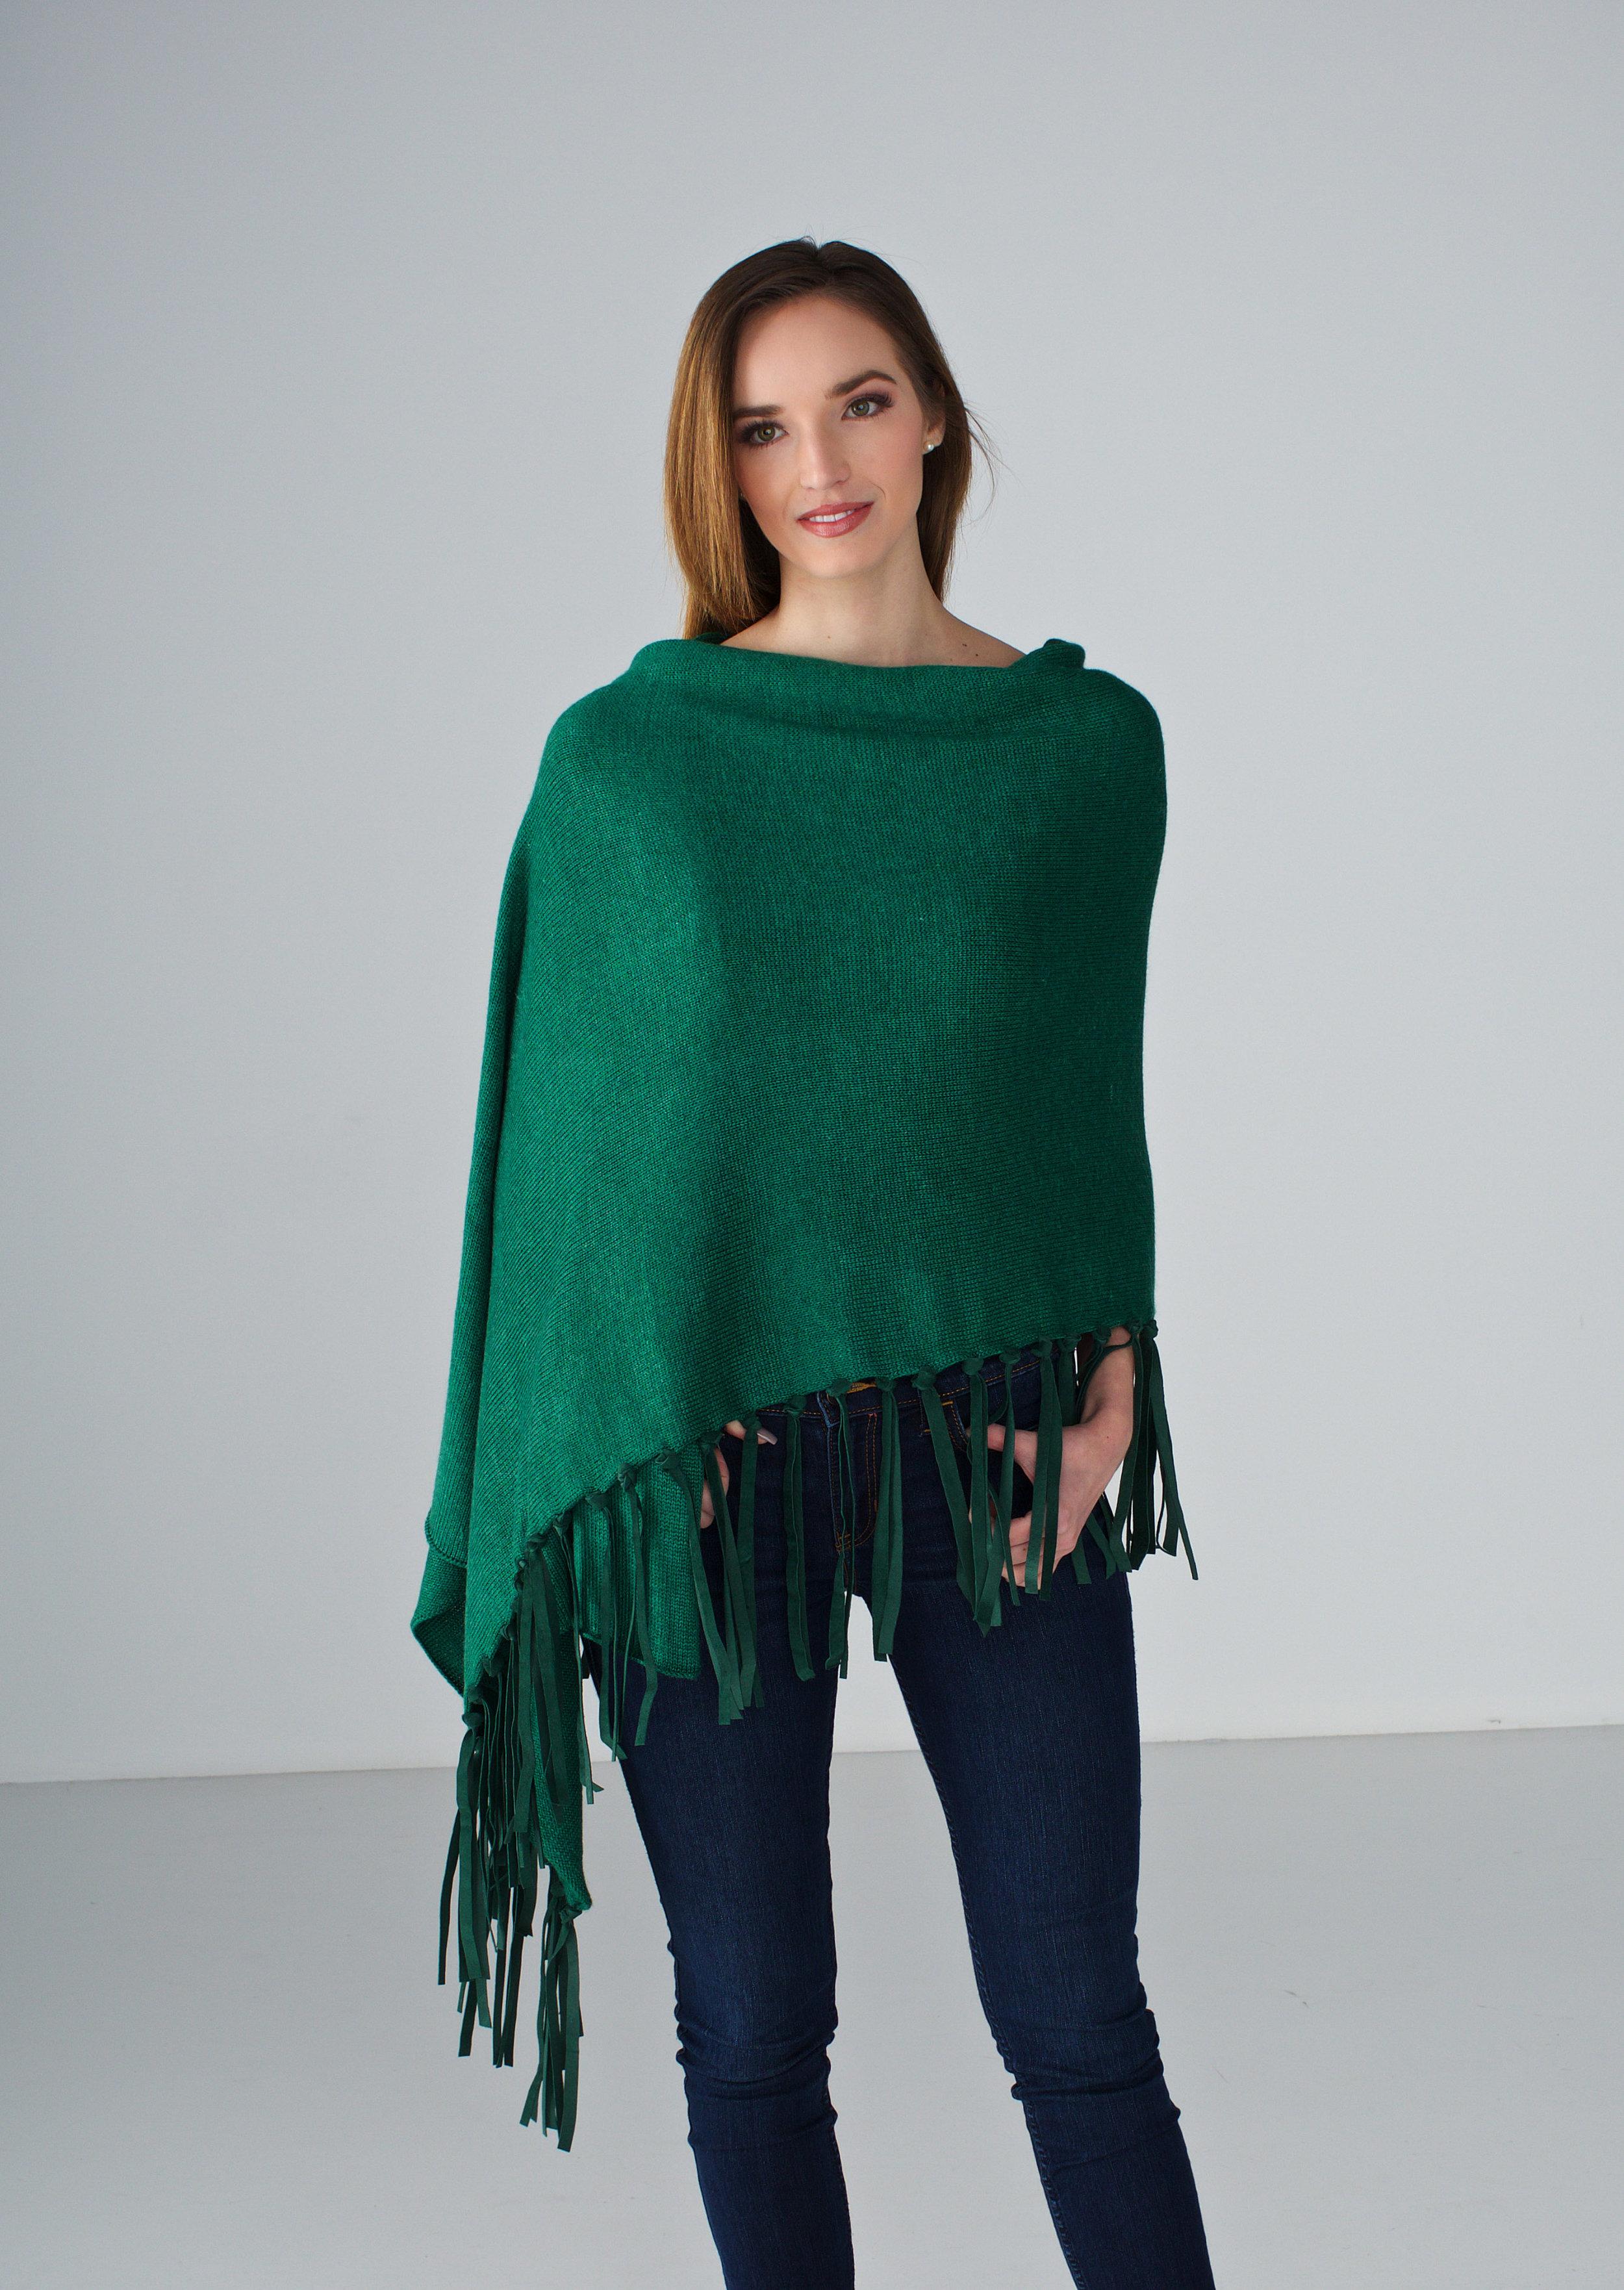 emerald wrap leatherC01B6102.jpg